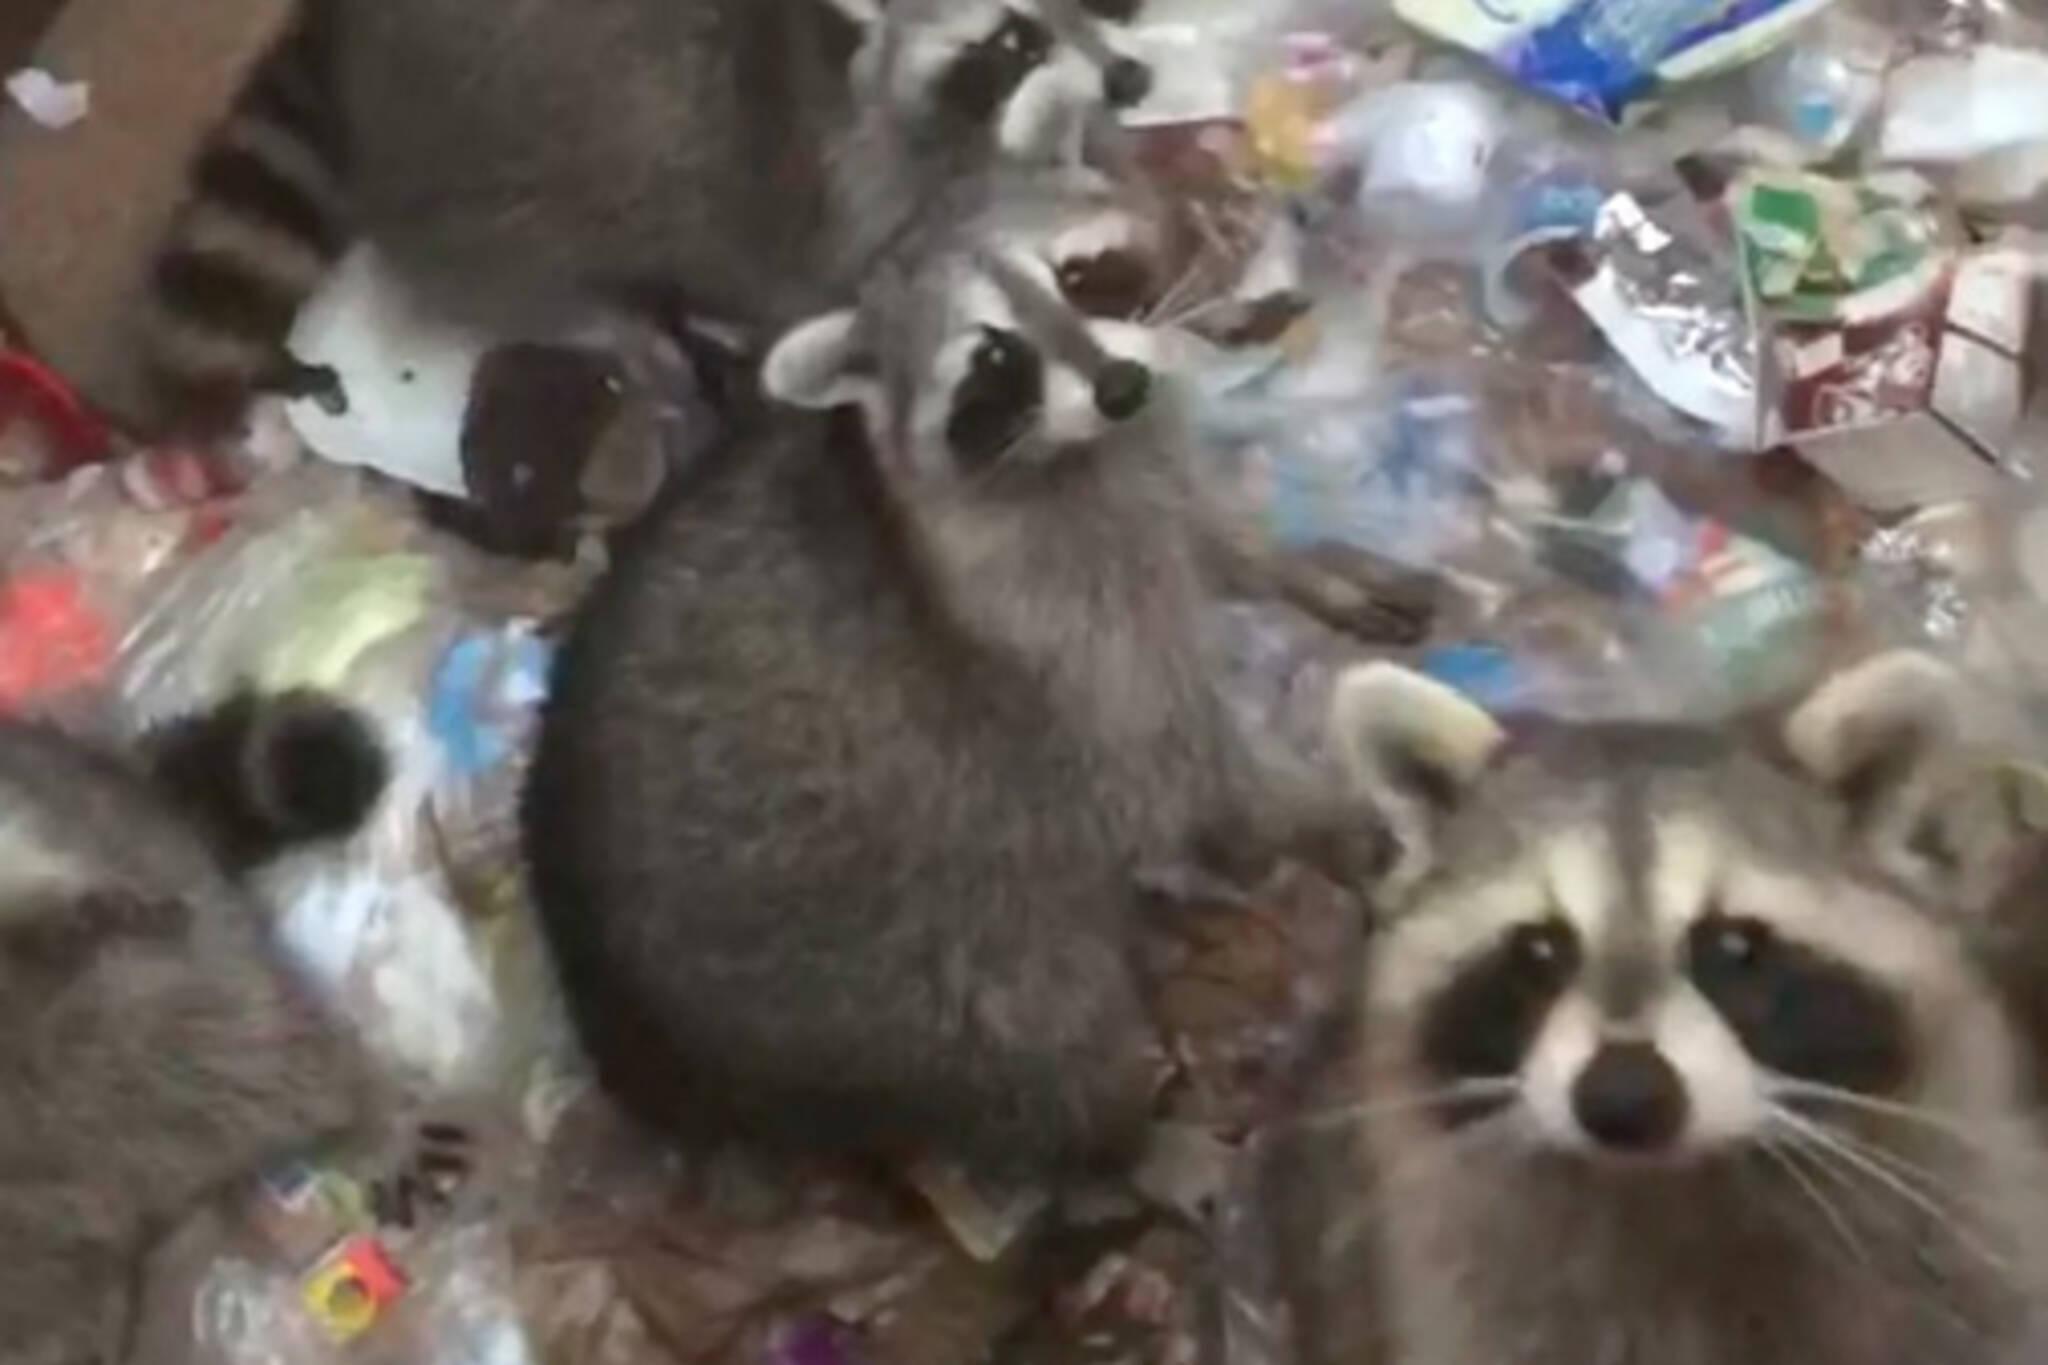 Toronto raccoons dumpster